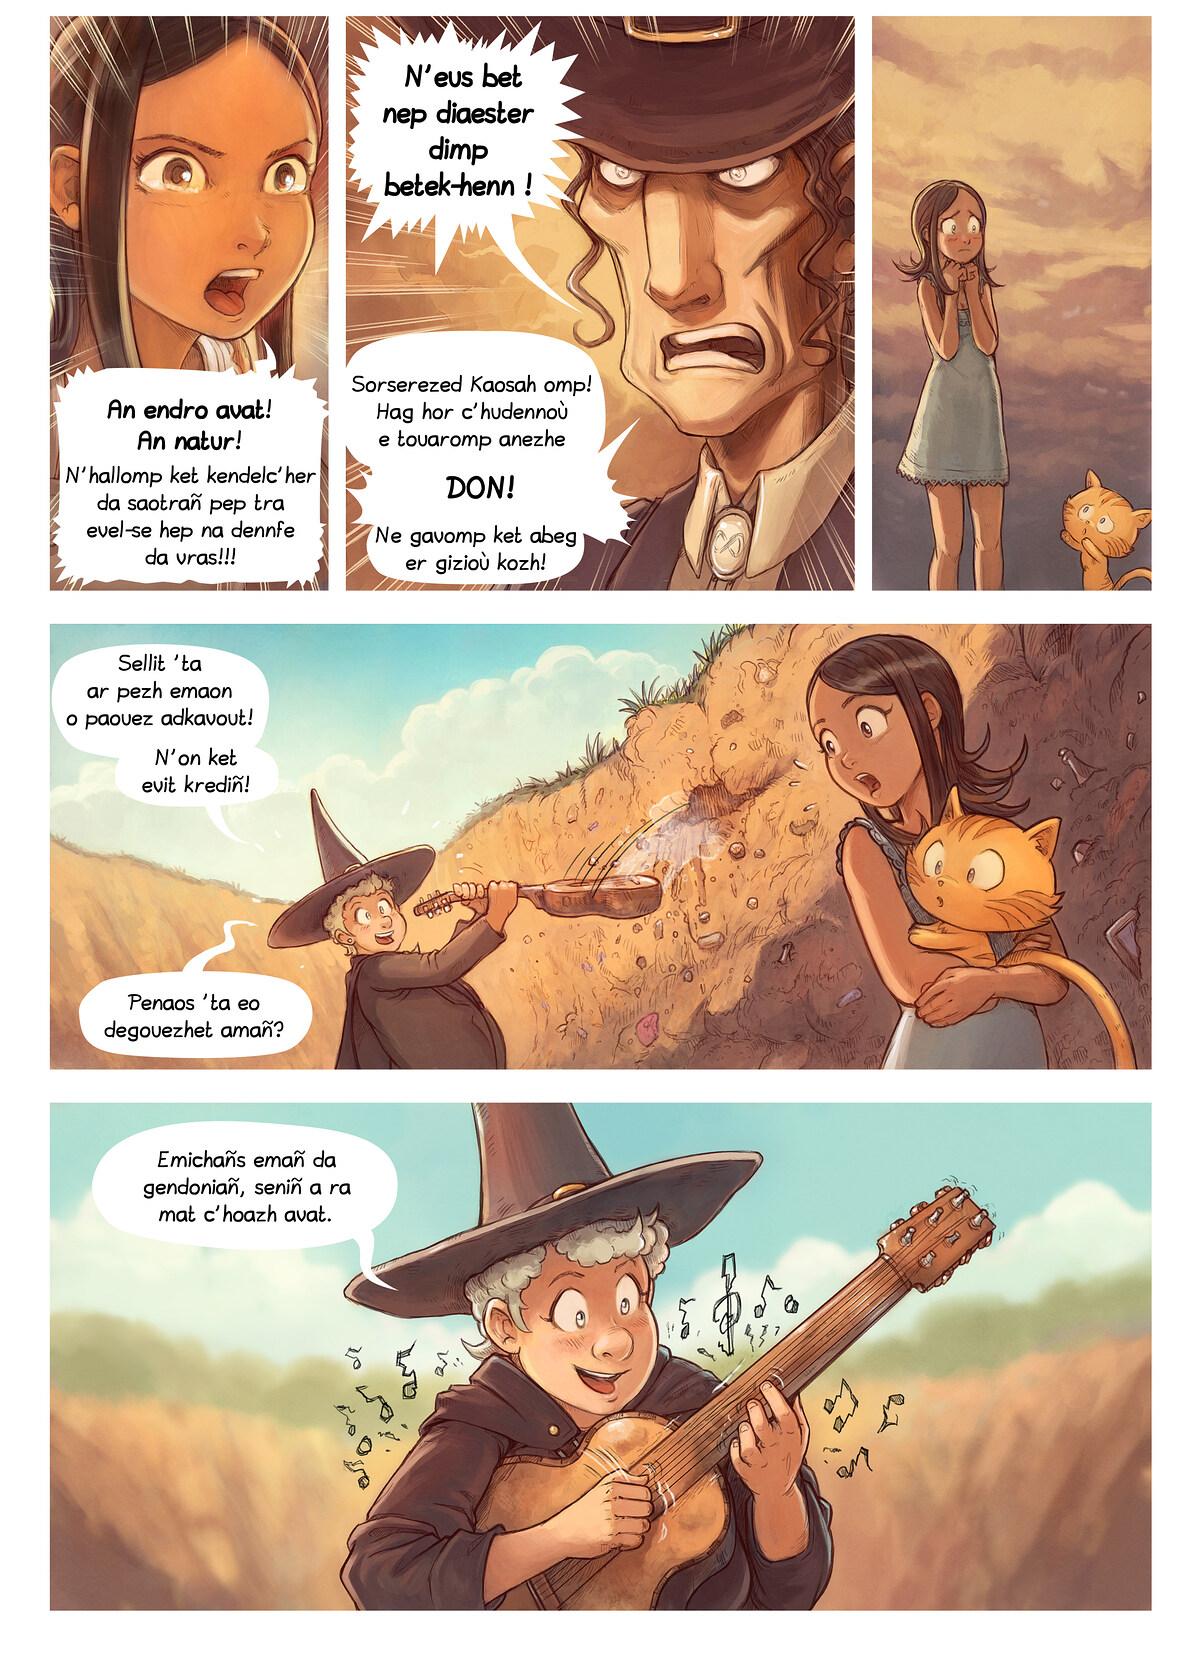 A webcomic page of Pepper&Carrot, rann 19 [br], pajenn 6